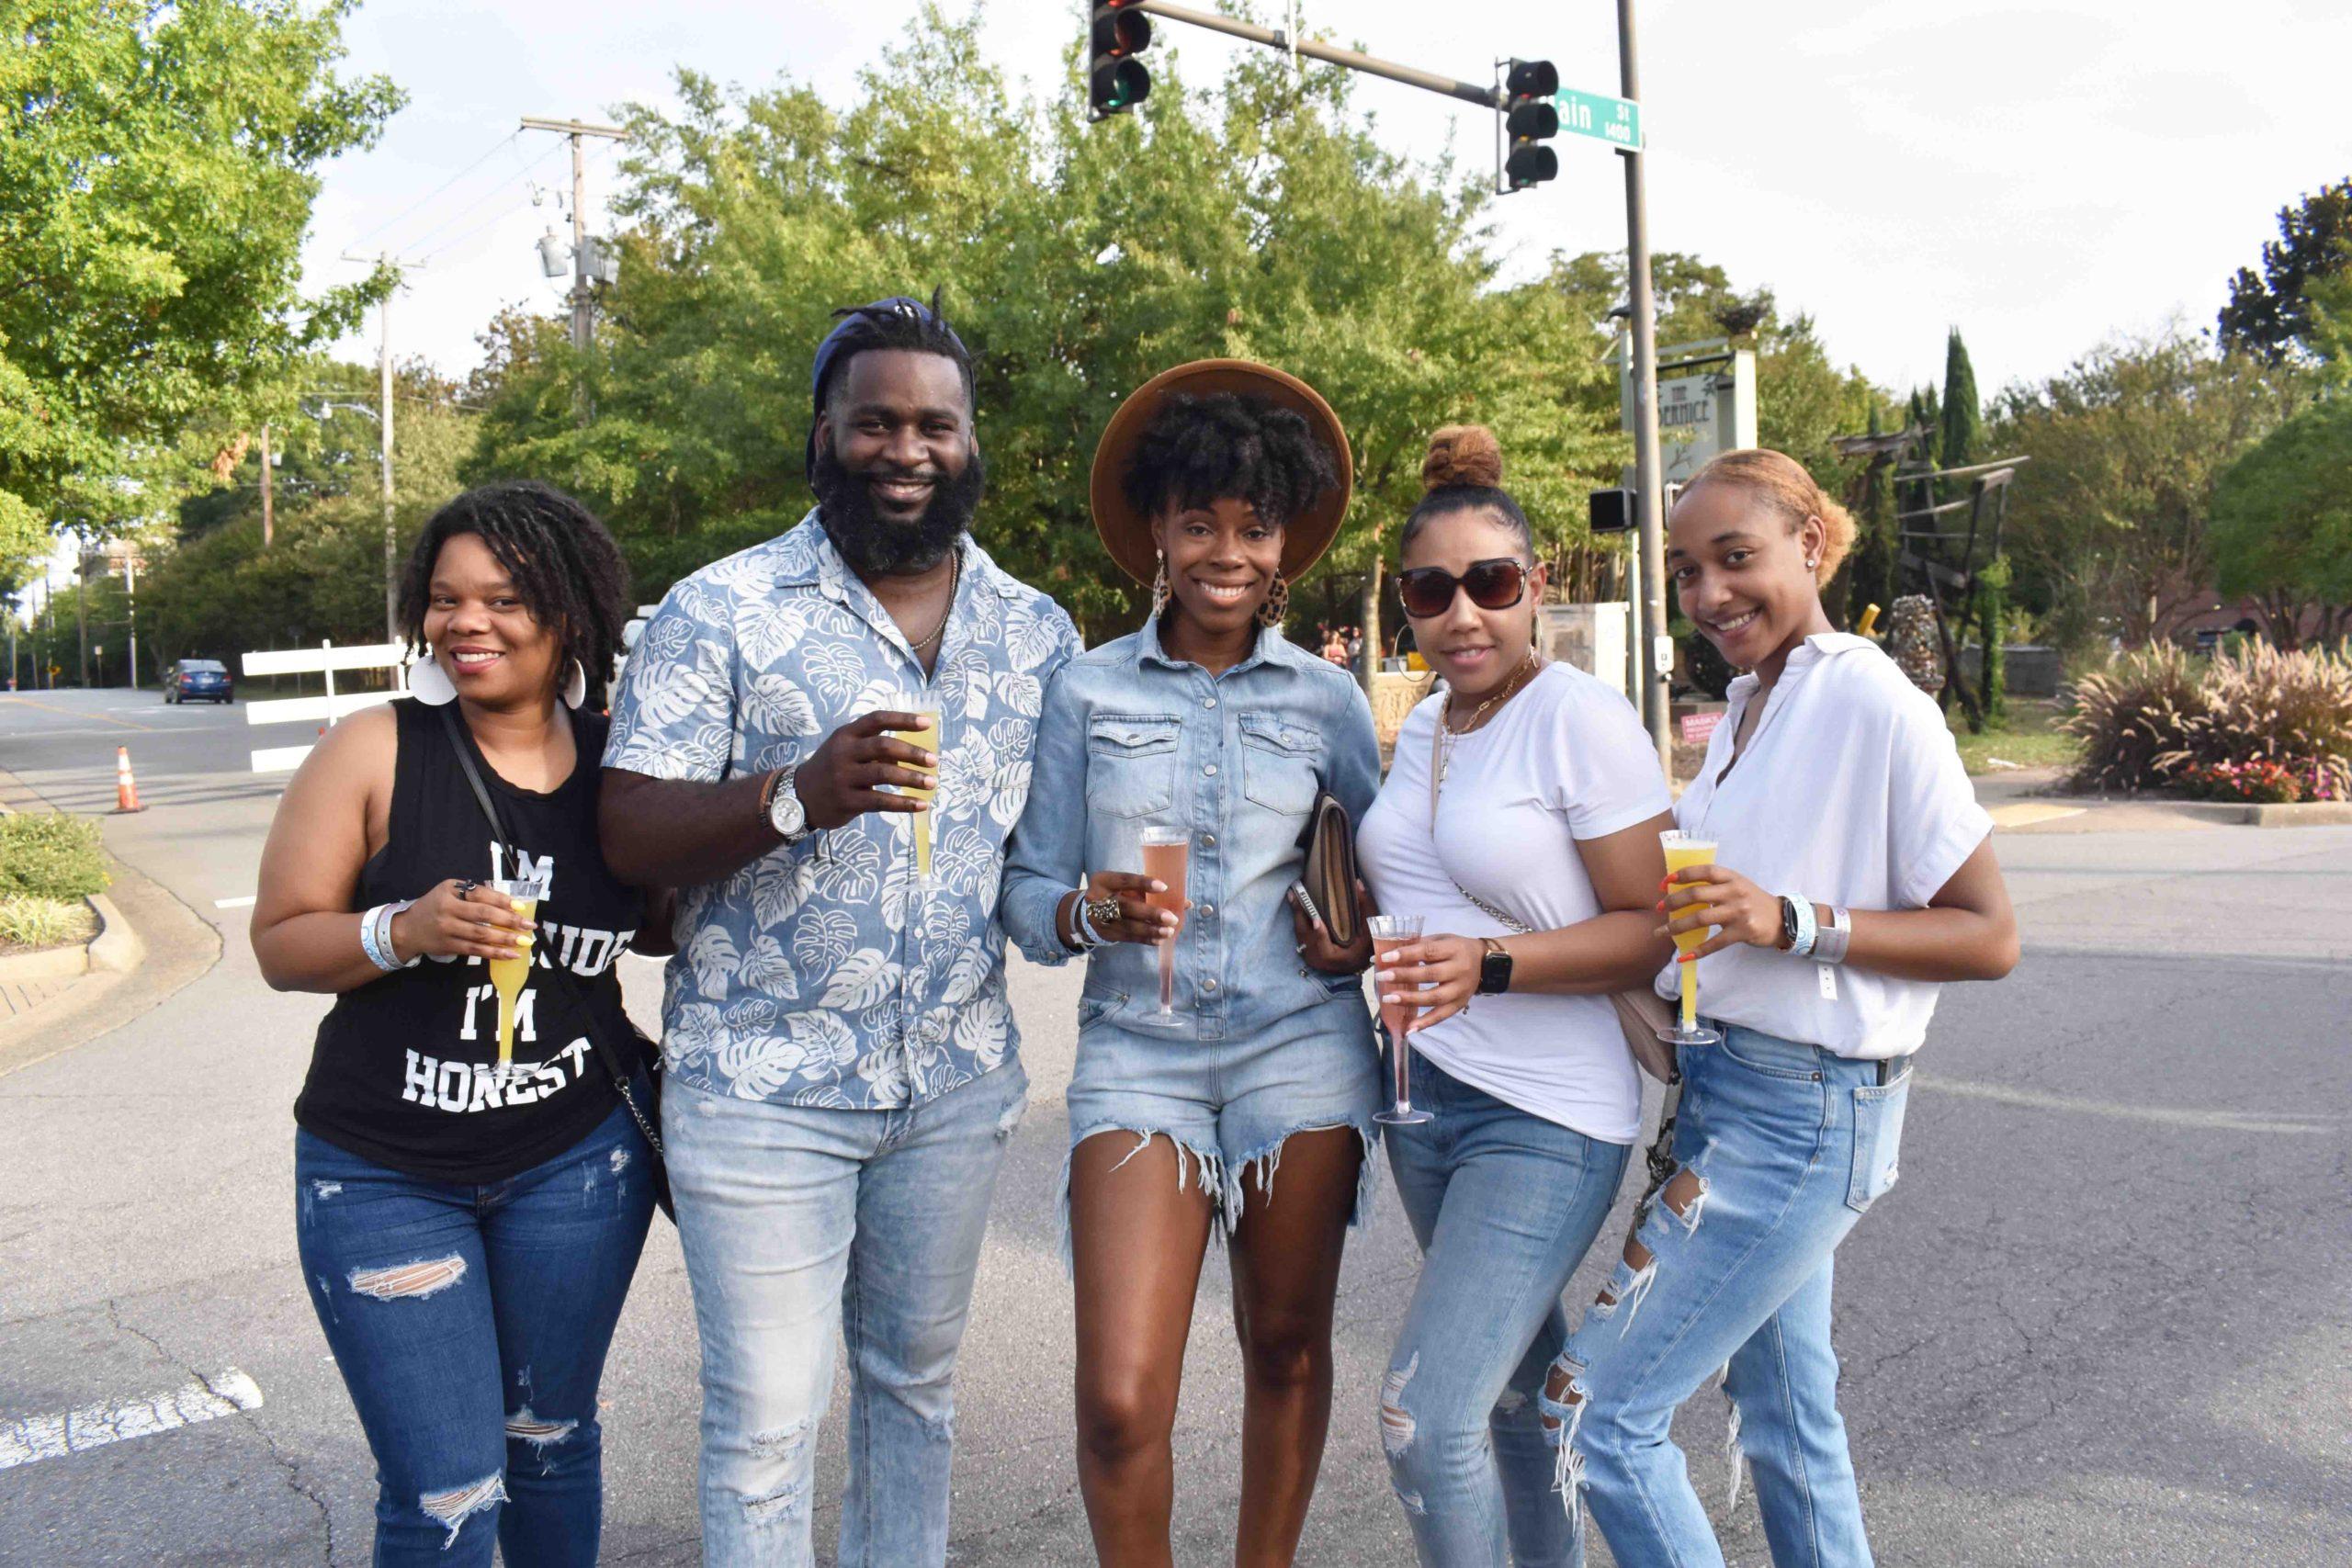 Ebony Jones, Kwele and Krystal Ross, Kimberly Davis, Kyla Davis